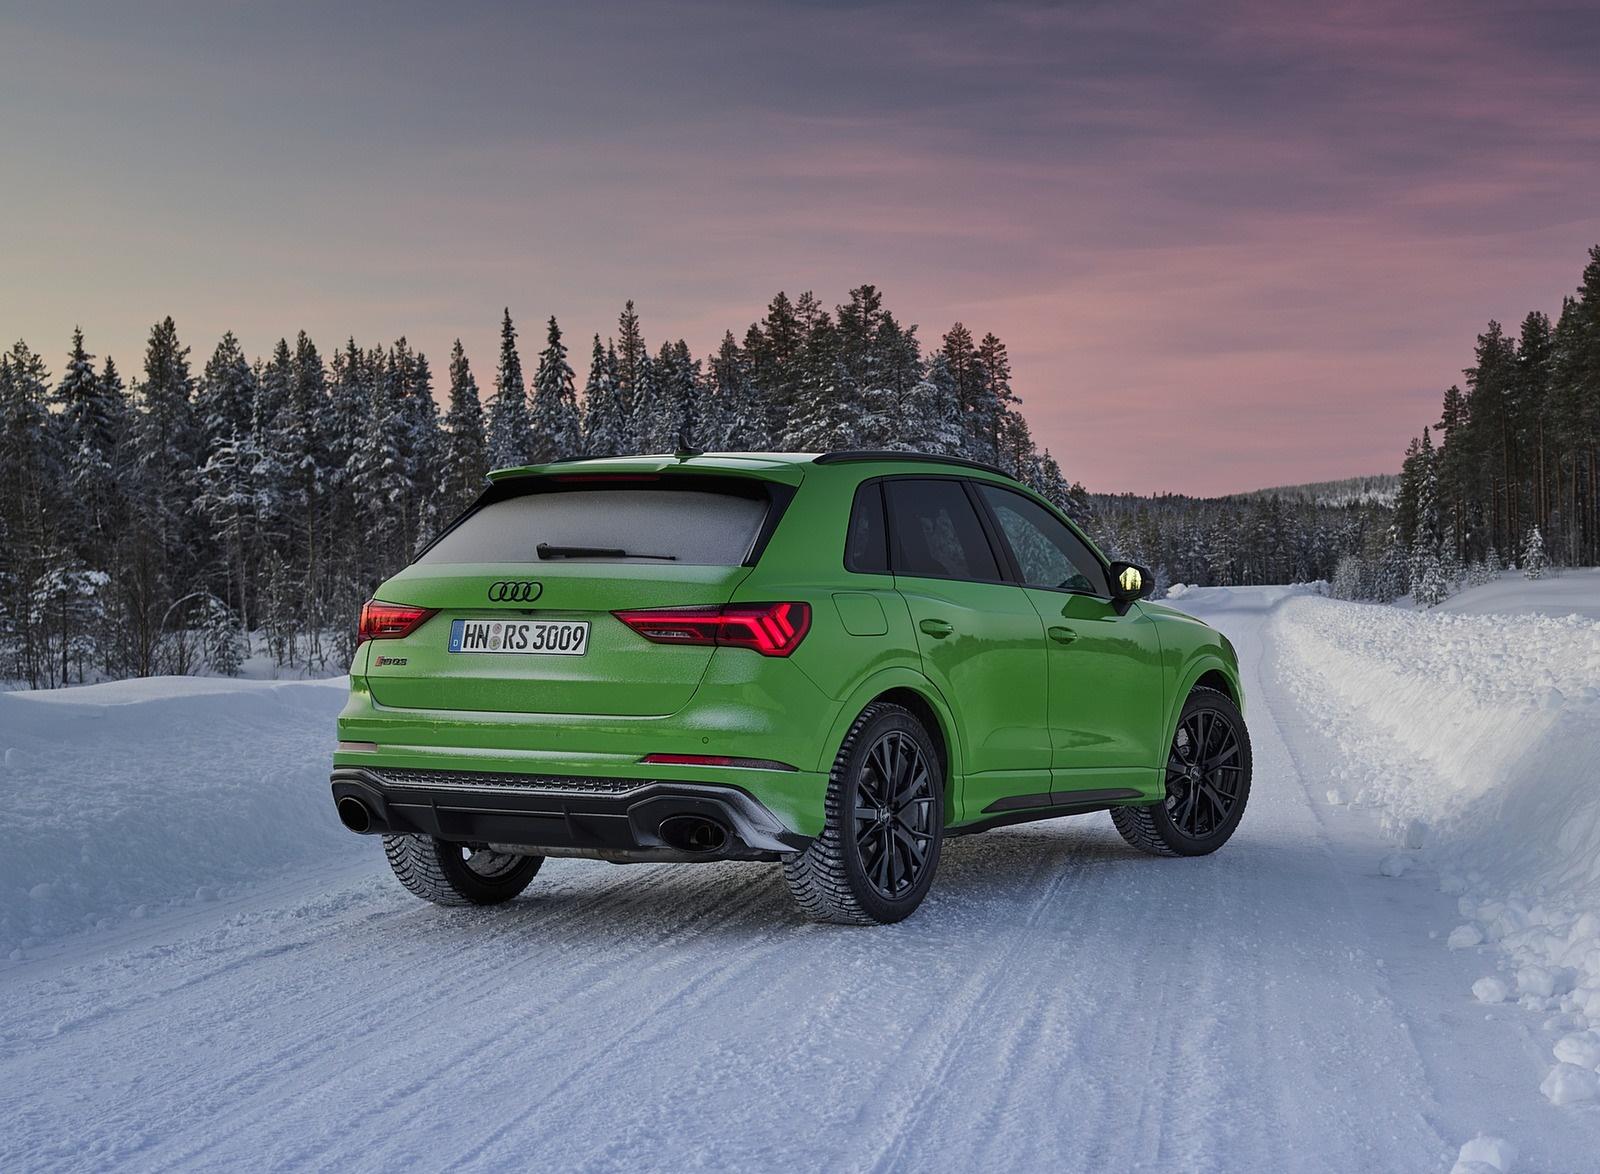 2020 Audi RS Q3 (Color: Kyalami Green) Rear Three-Quarter Wallpapers #34 of 116